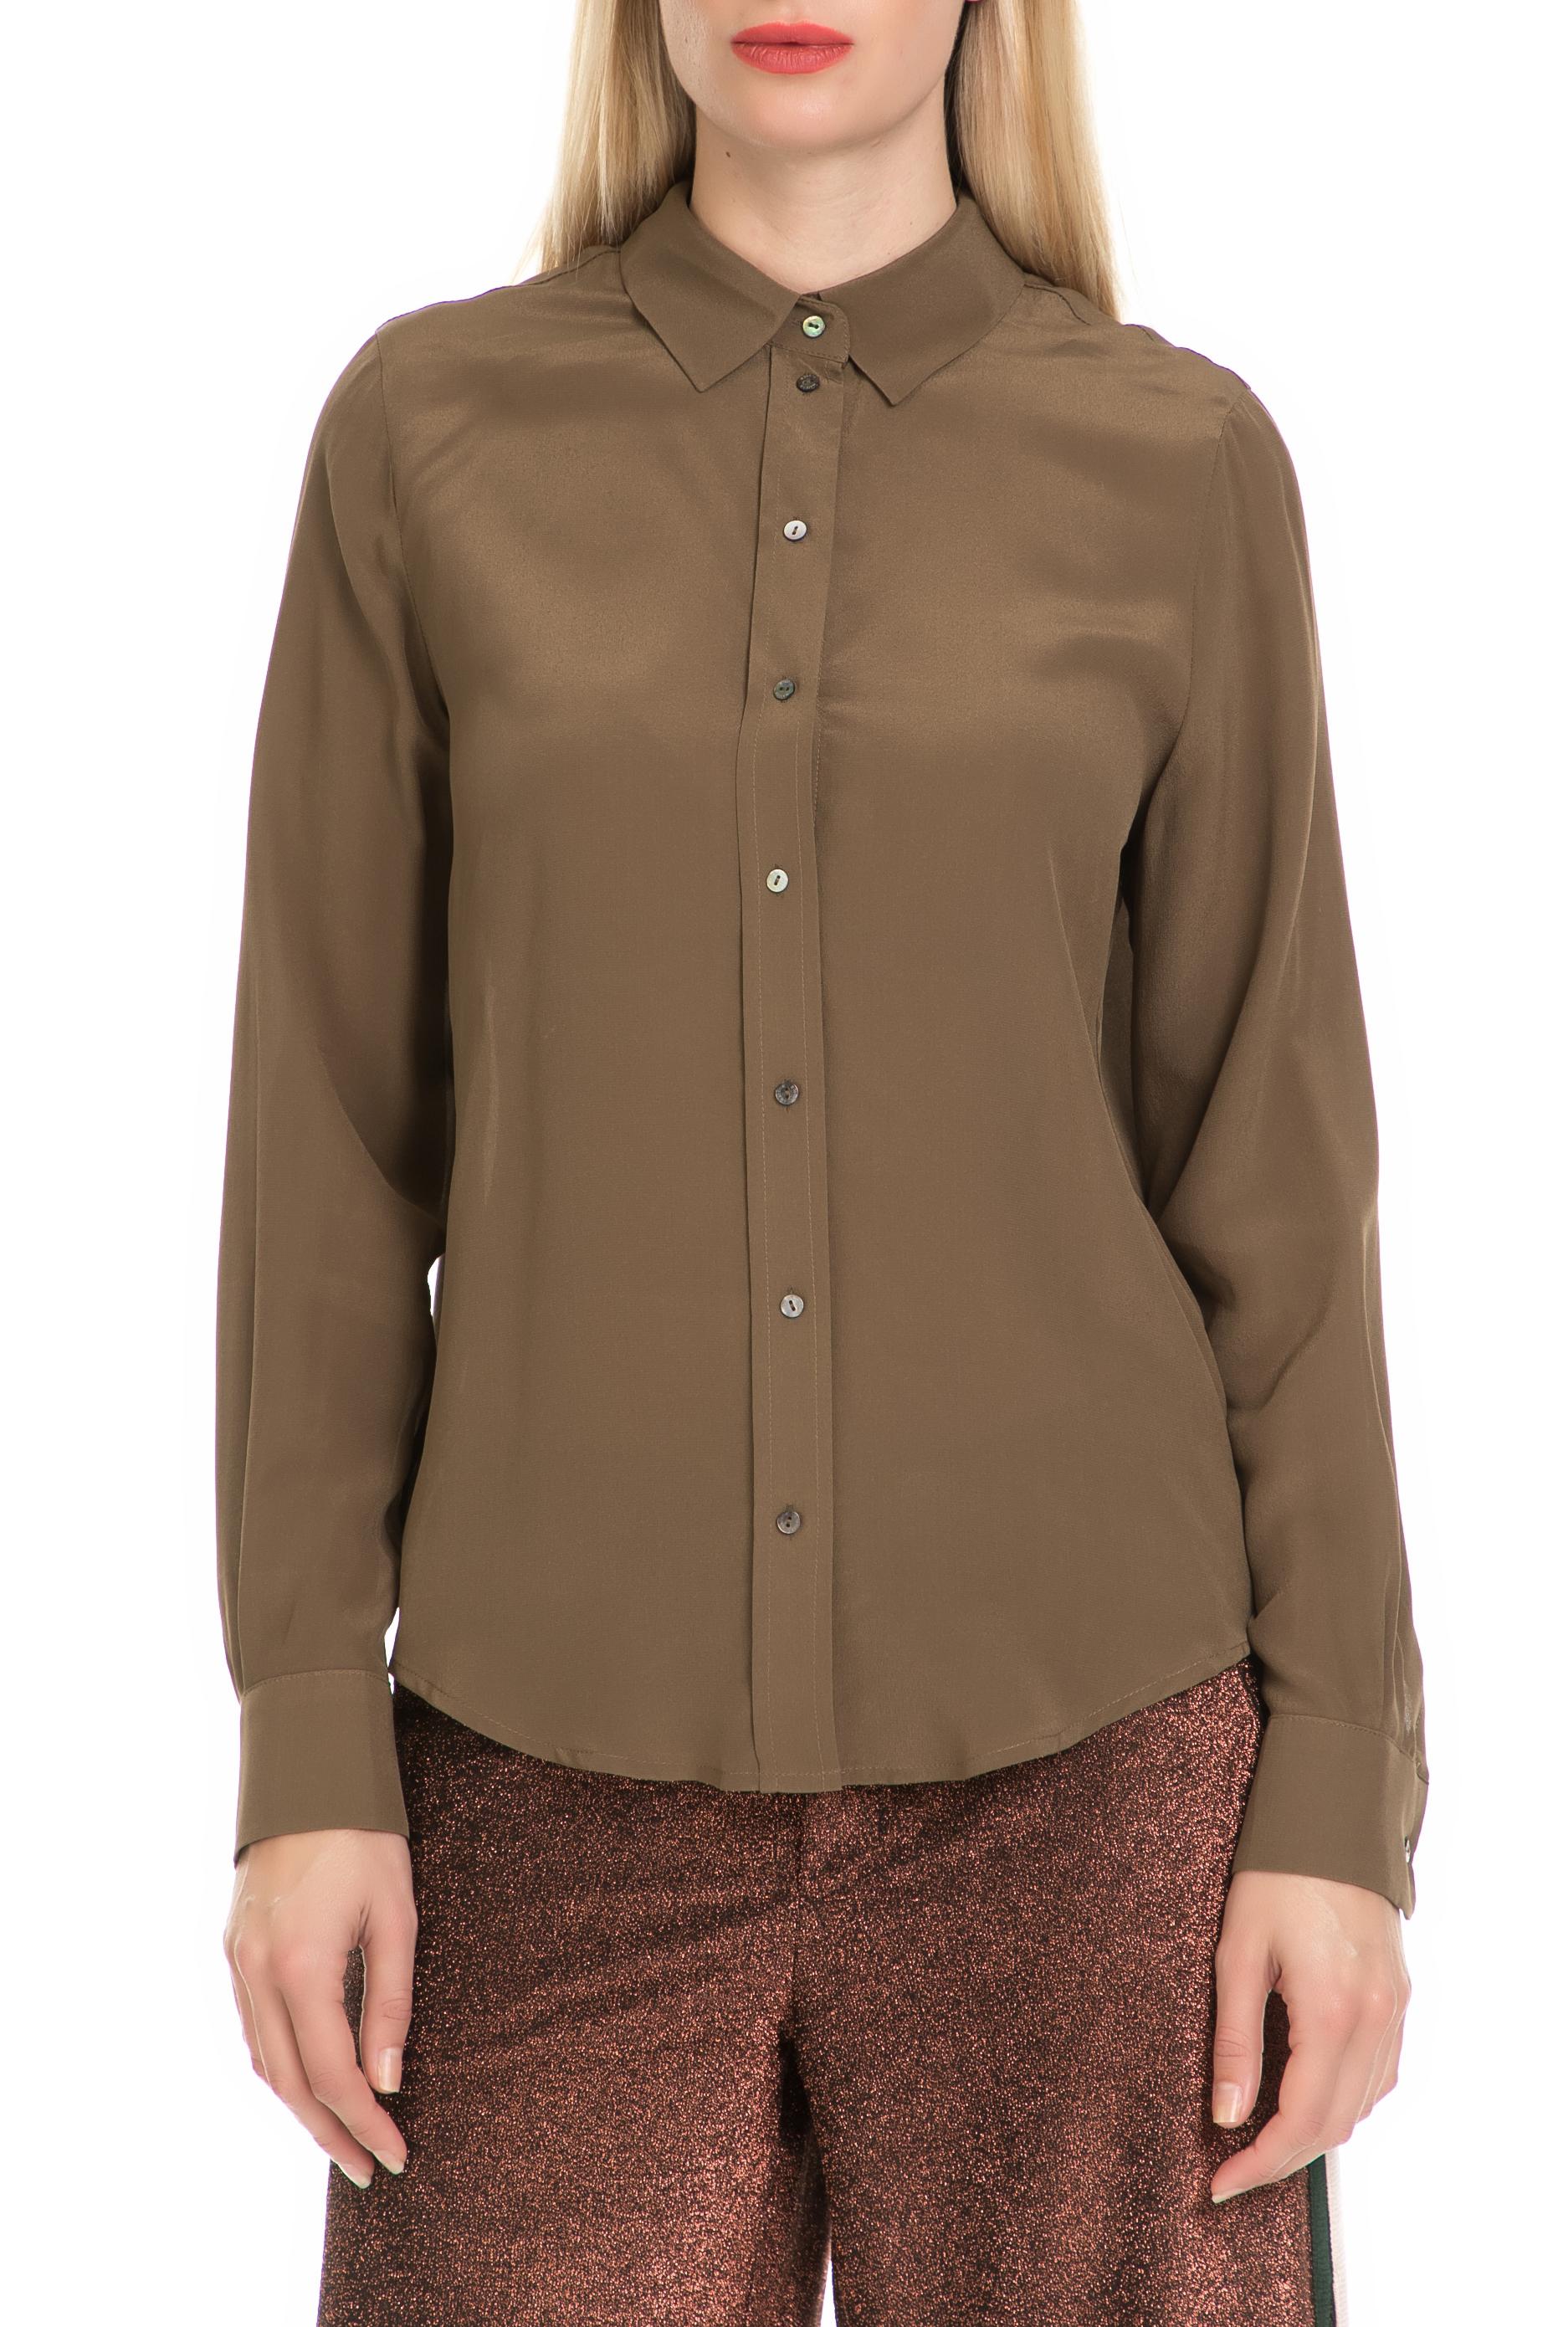 SCOTCH & SODA - Γυναικείο πουκάμισο SCOTCH & SODA καφέ γυναικεία ρούχα πουκάμισα μακρυμάνικα